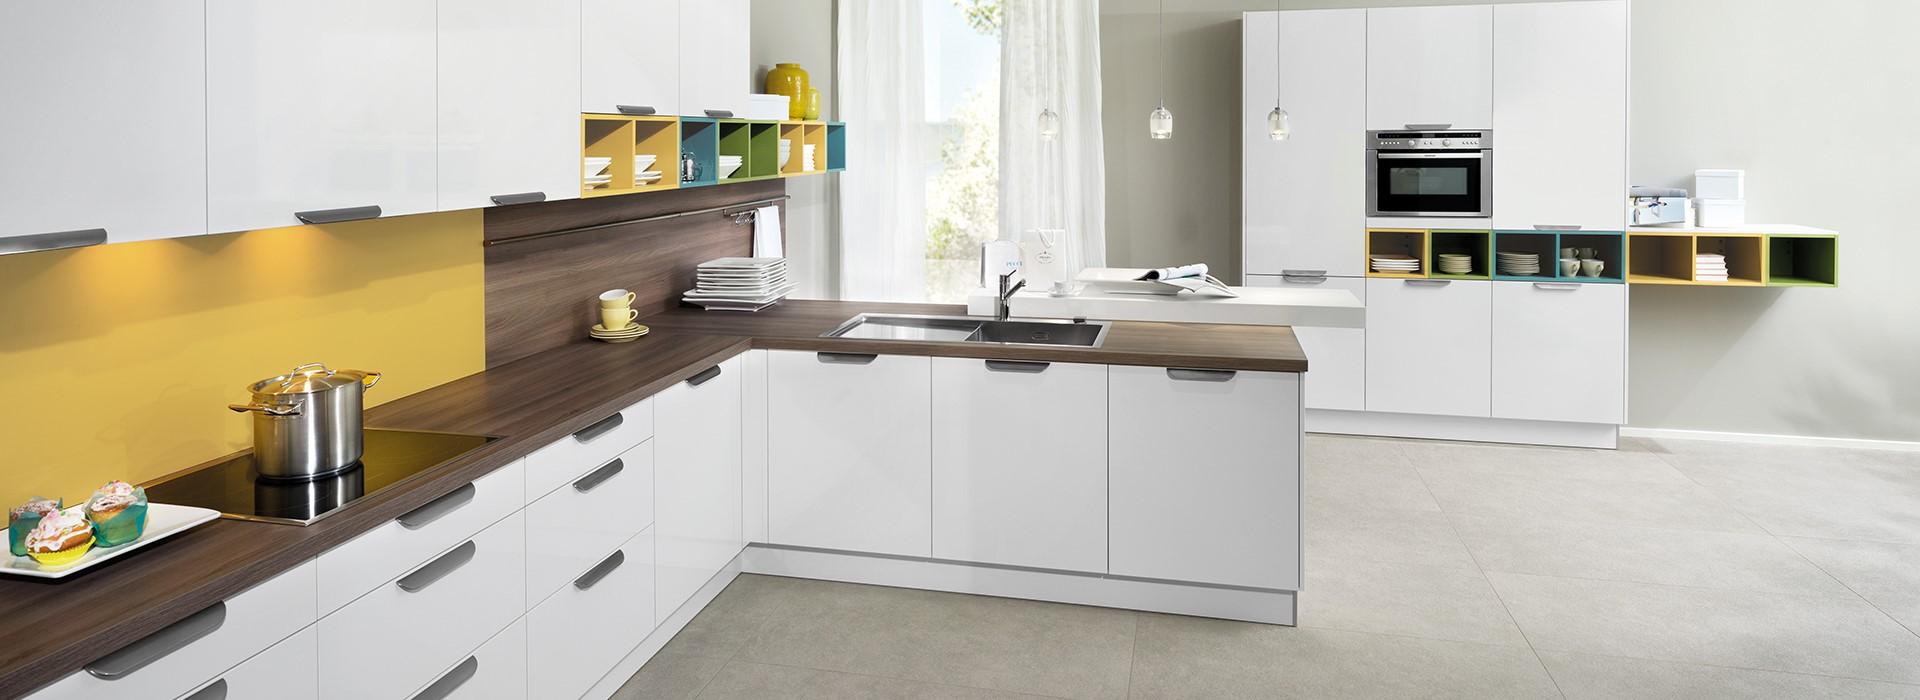 moderne k chen vom k chenchef aus magdeburg. Black Bedroom Furniture Sets. Home Design Ideas